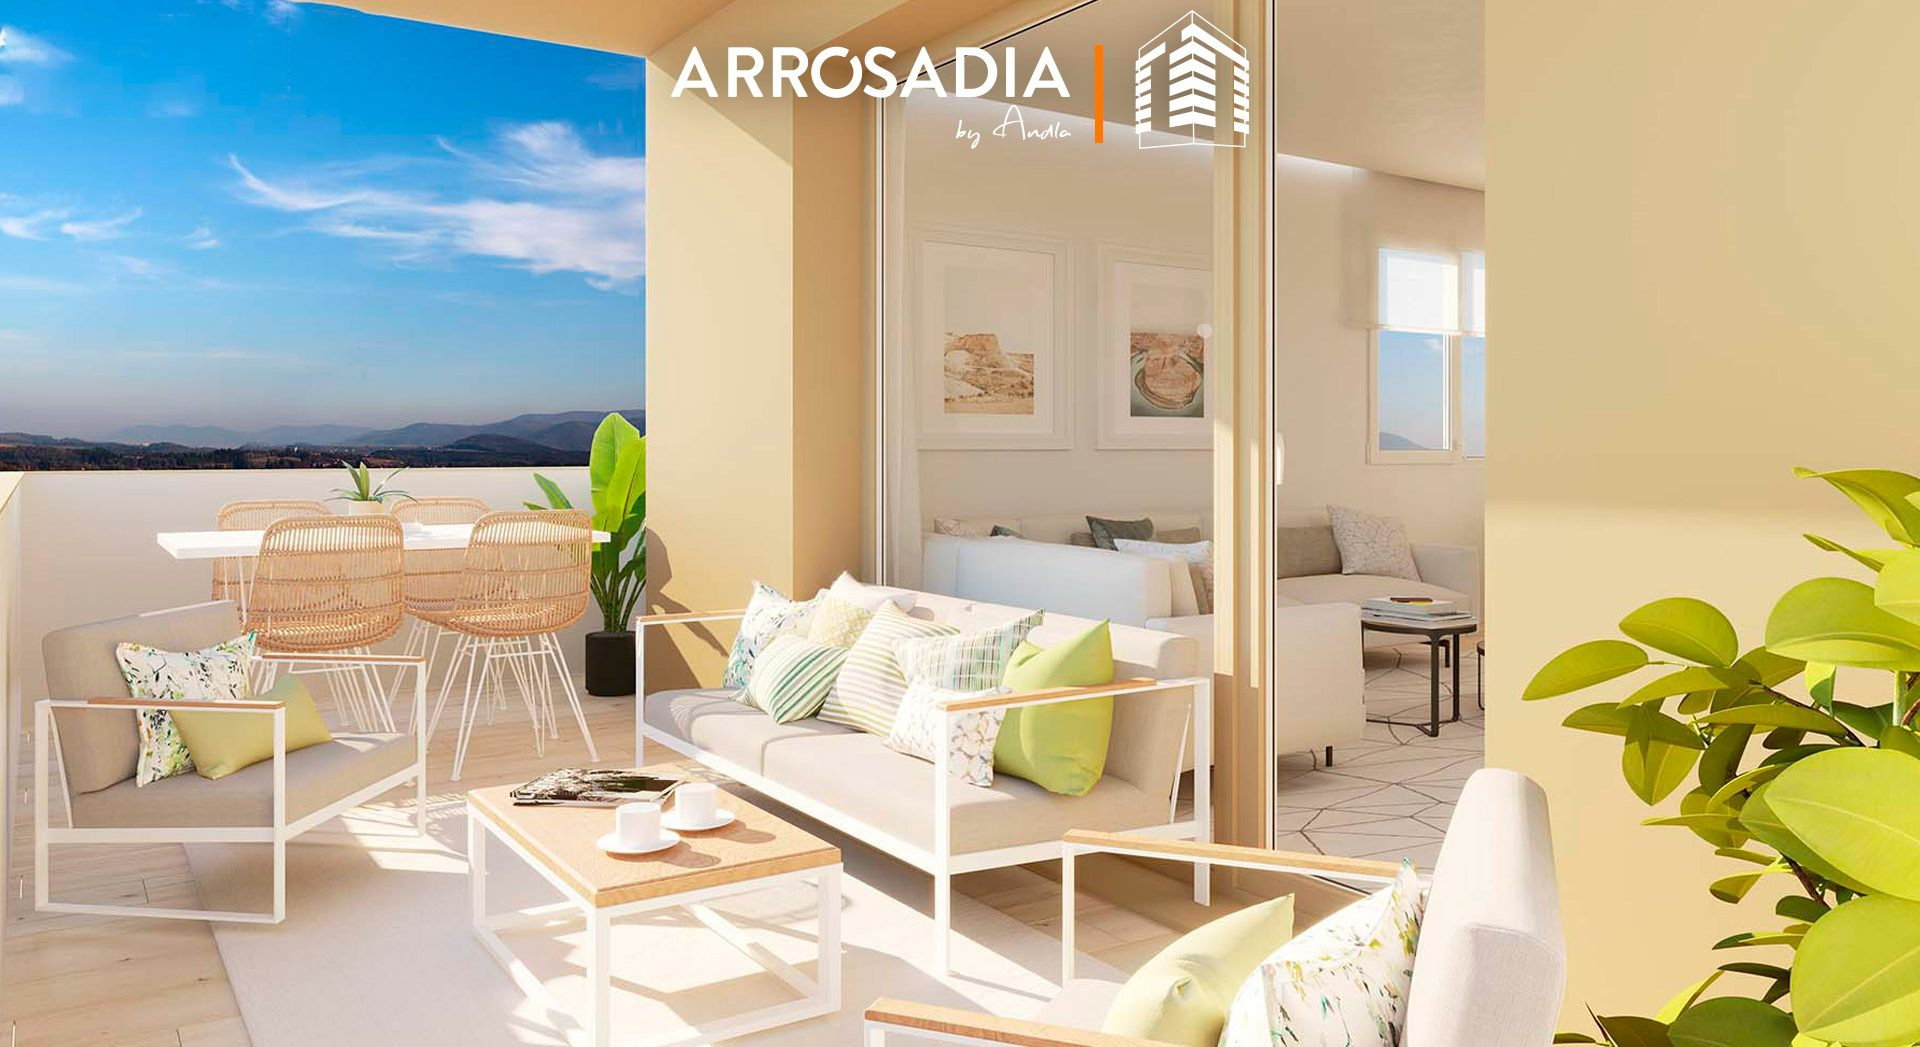 ANDIA_ARROSADIA_TERRAZA-slide-1920x1047